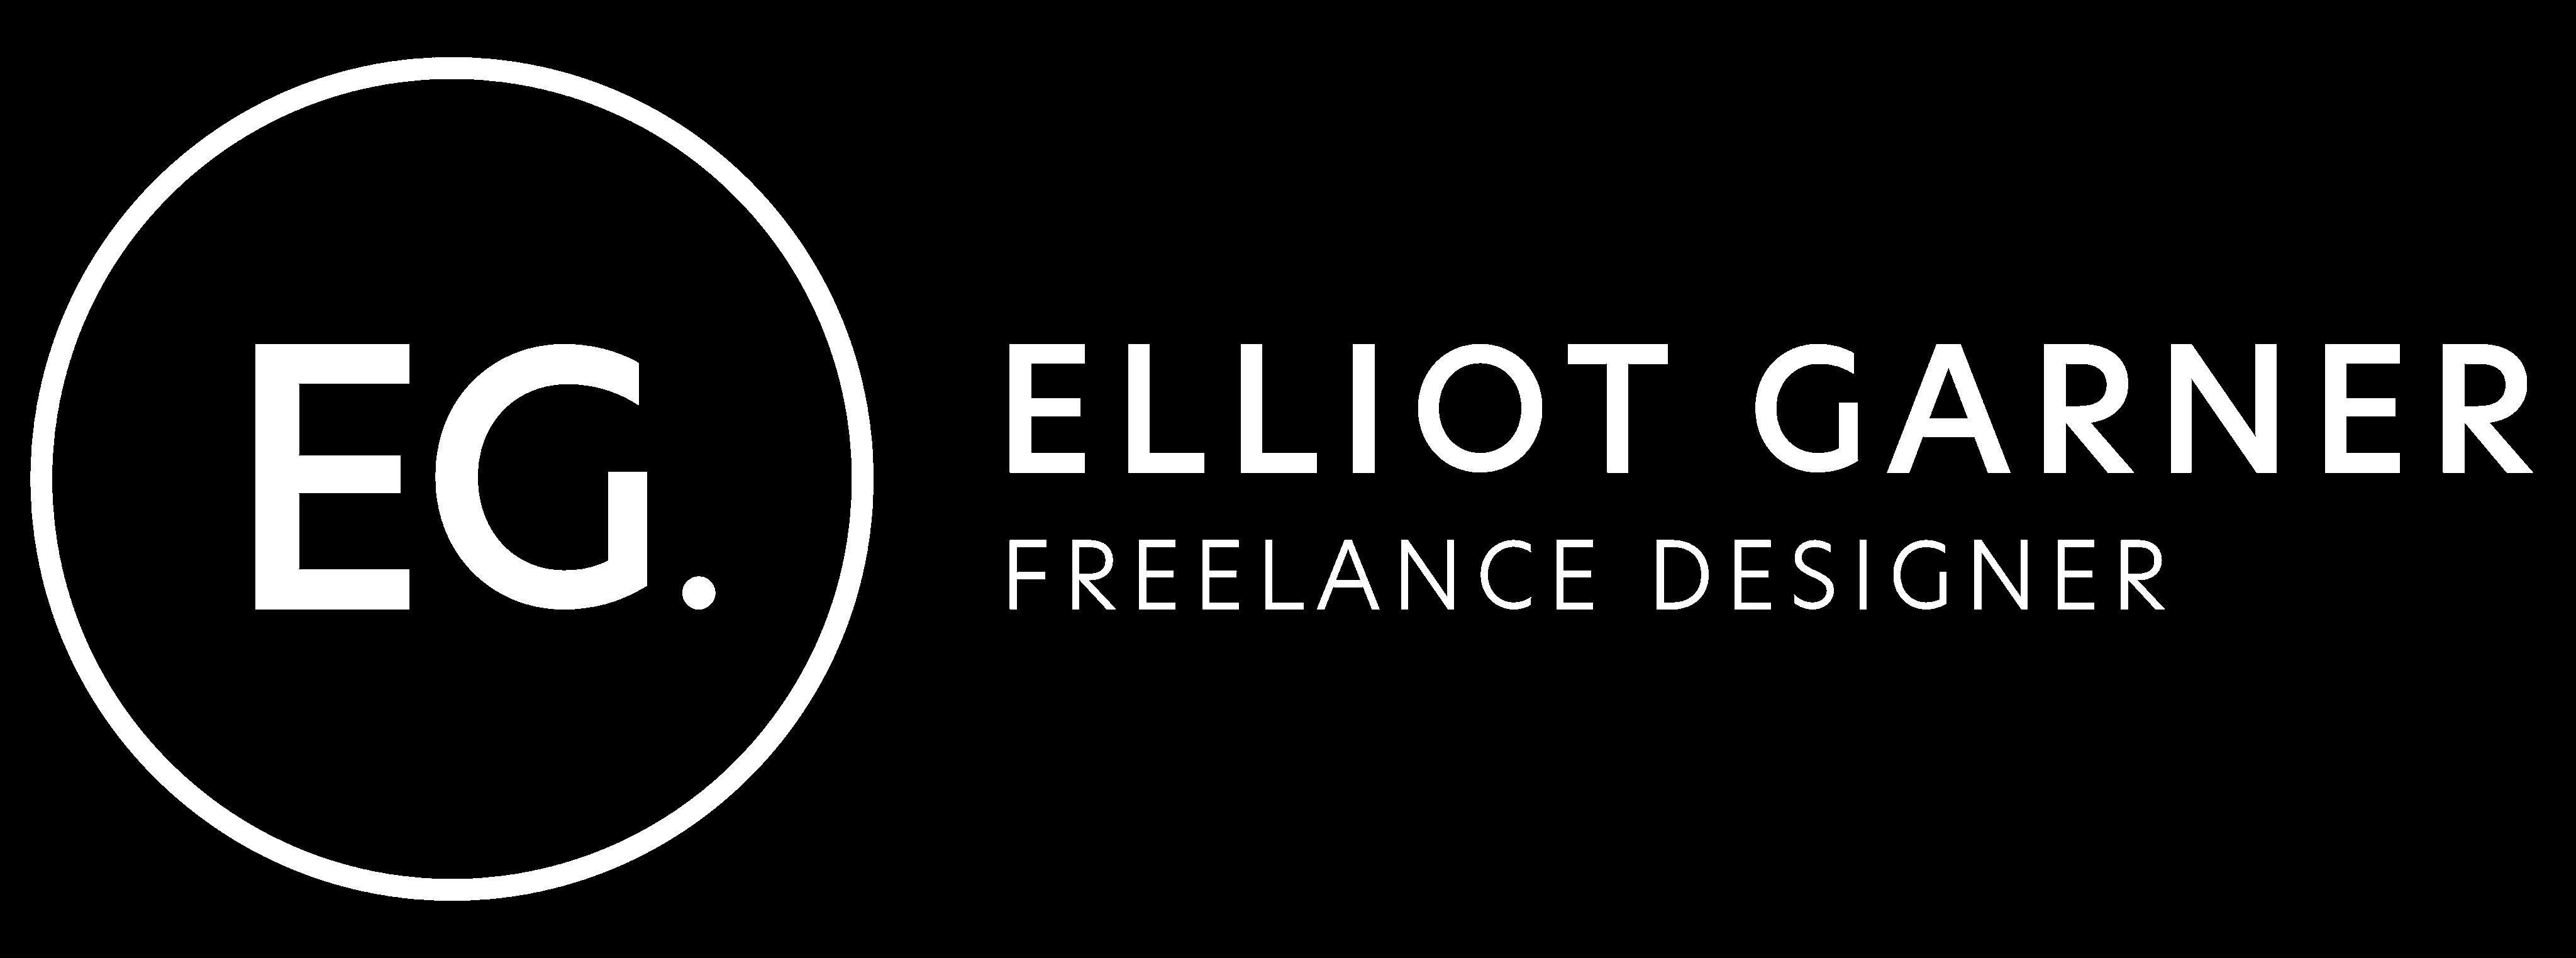 Elliot Garner